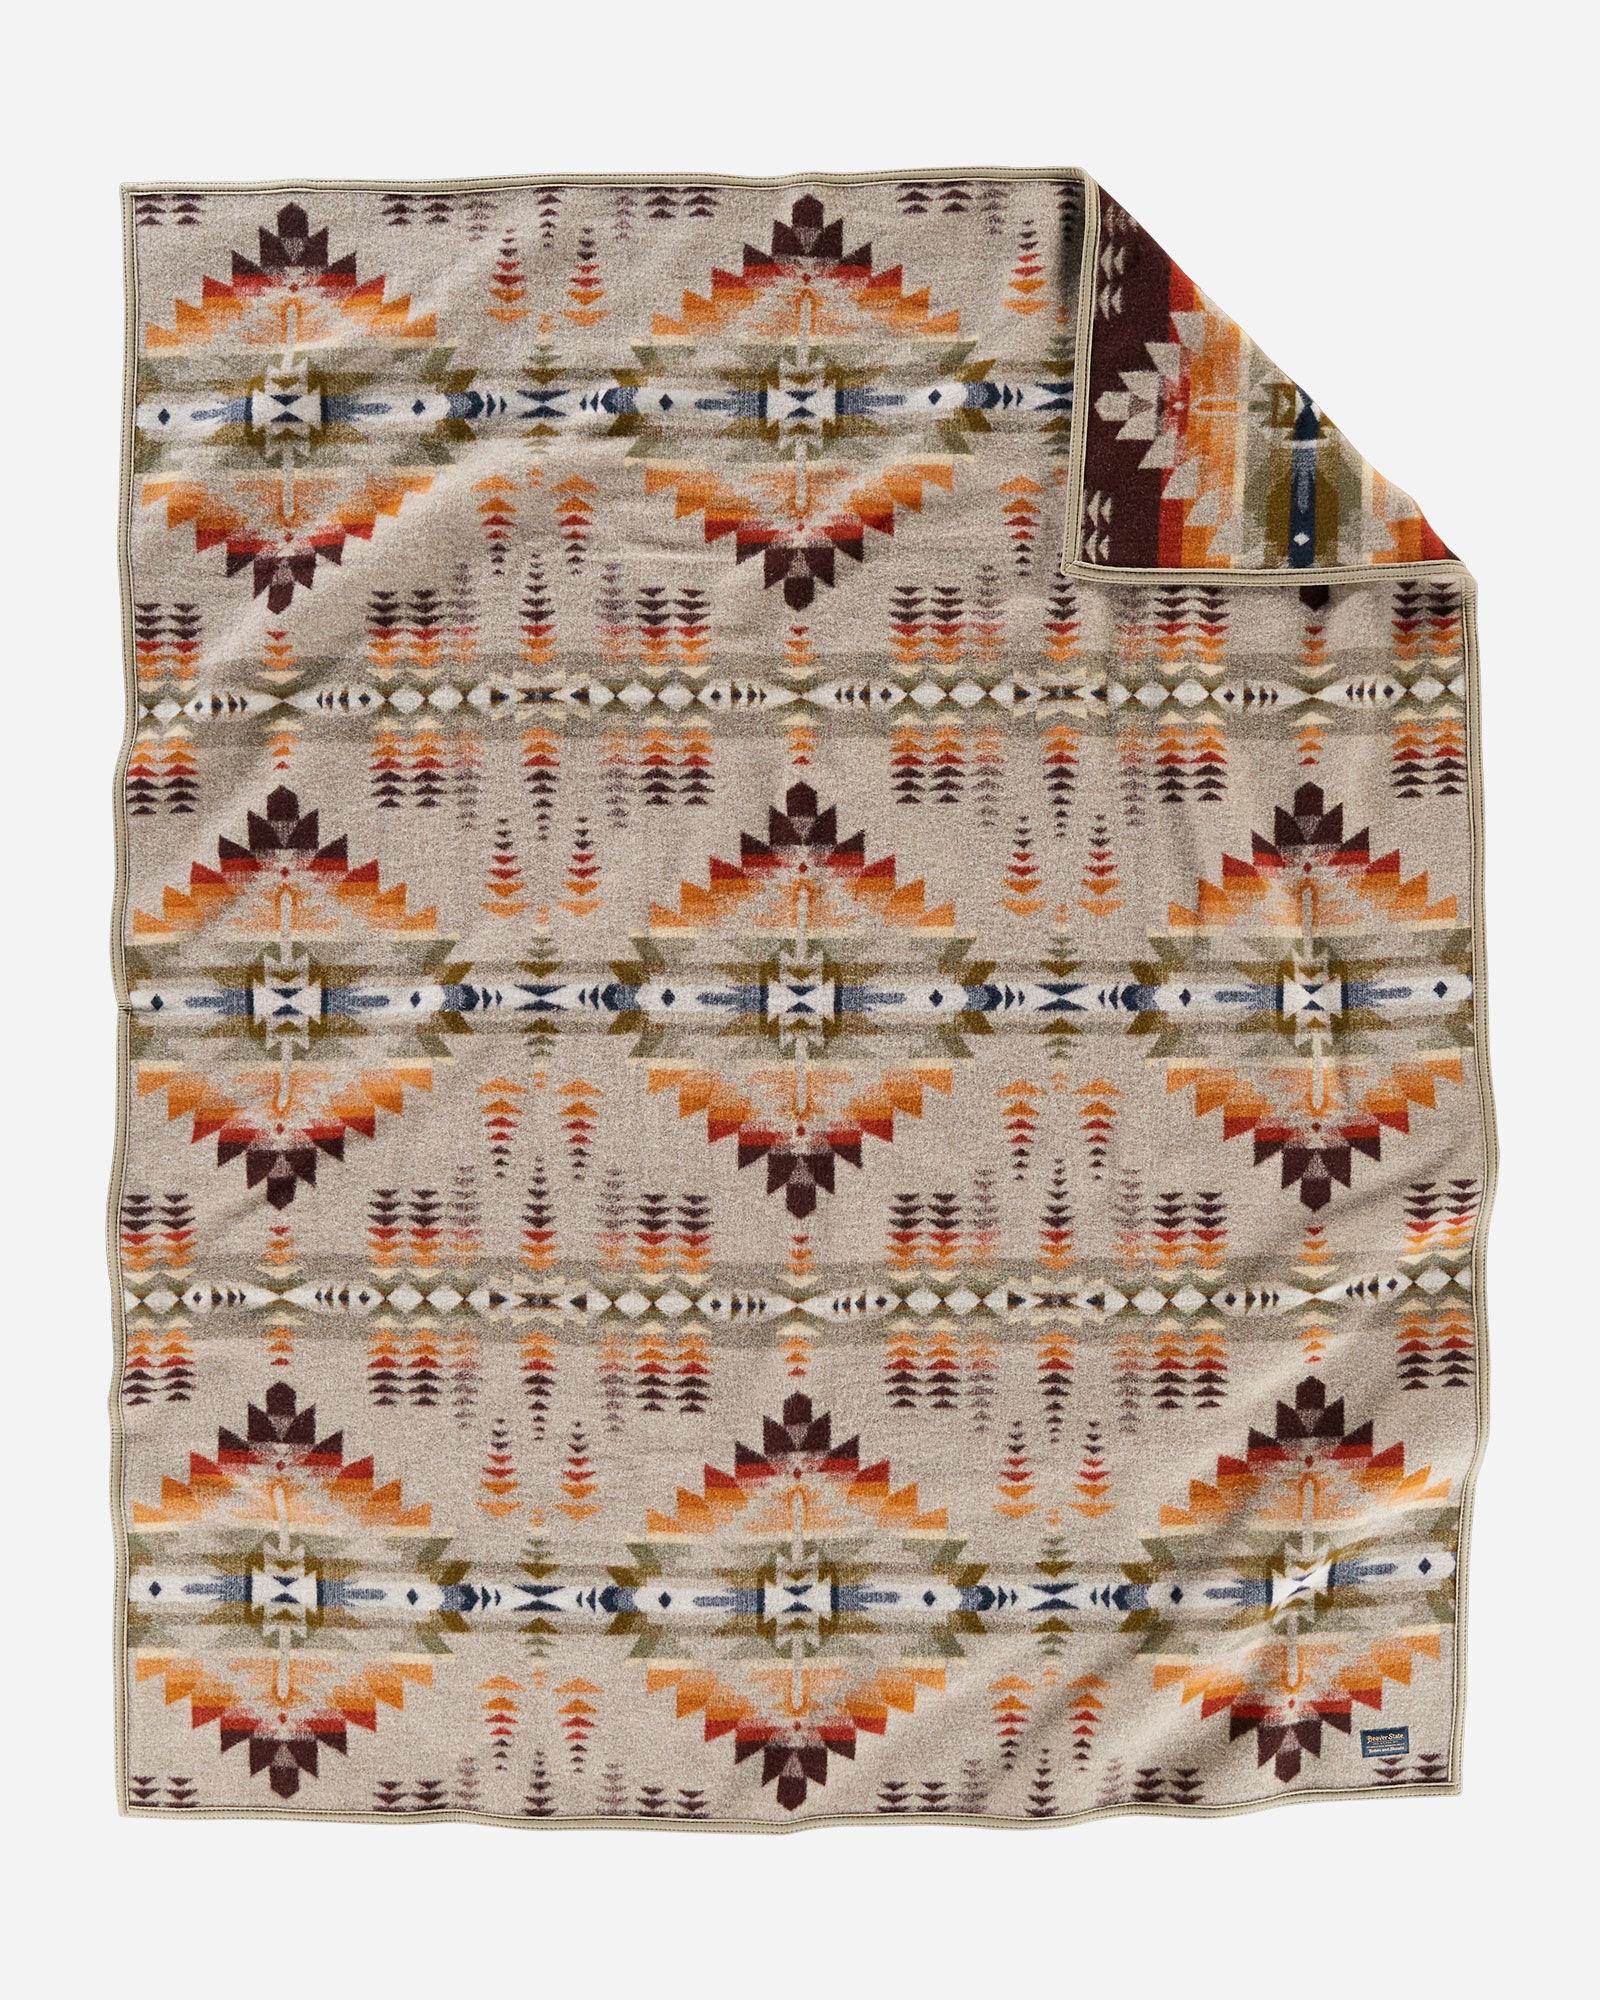 Juniper Mesa blanket by Pendleton - beige diamond designs